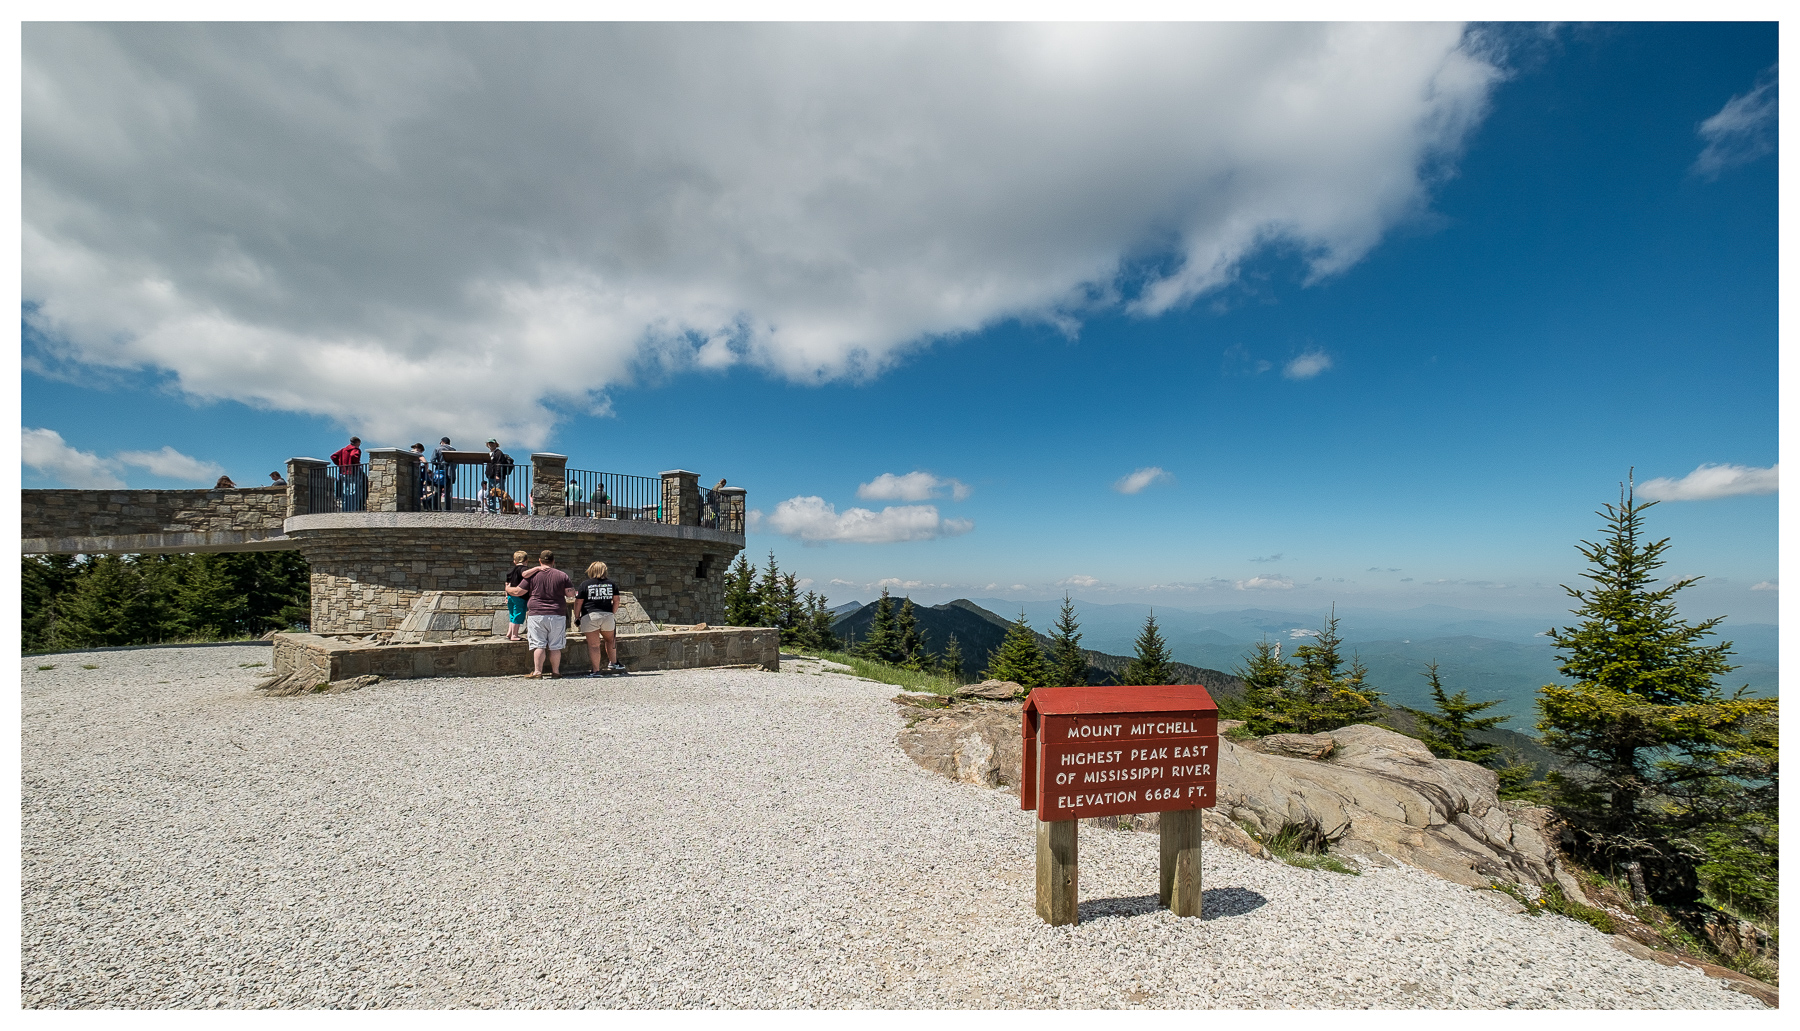 From Mount Mitchell summit